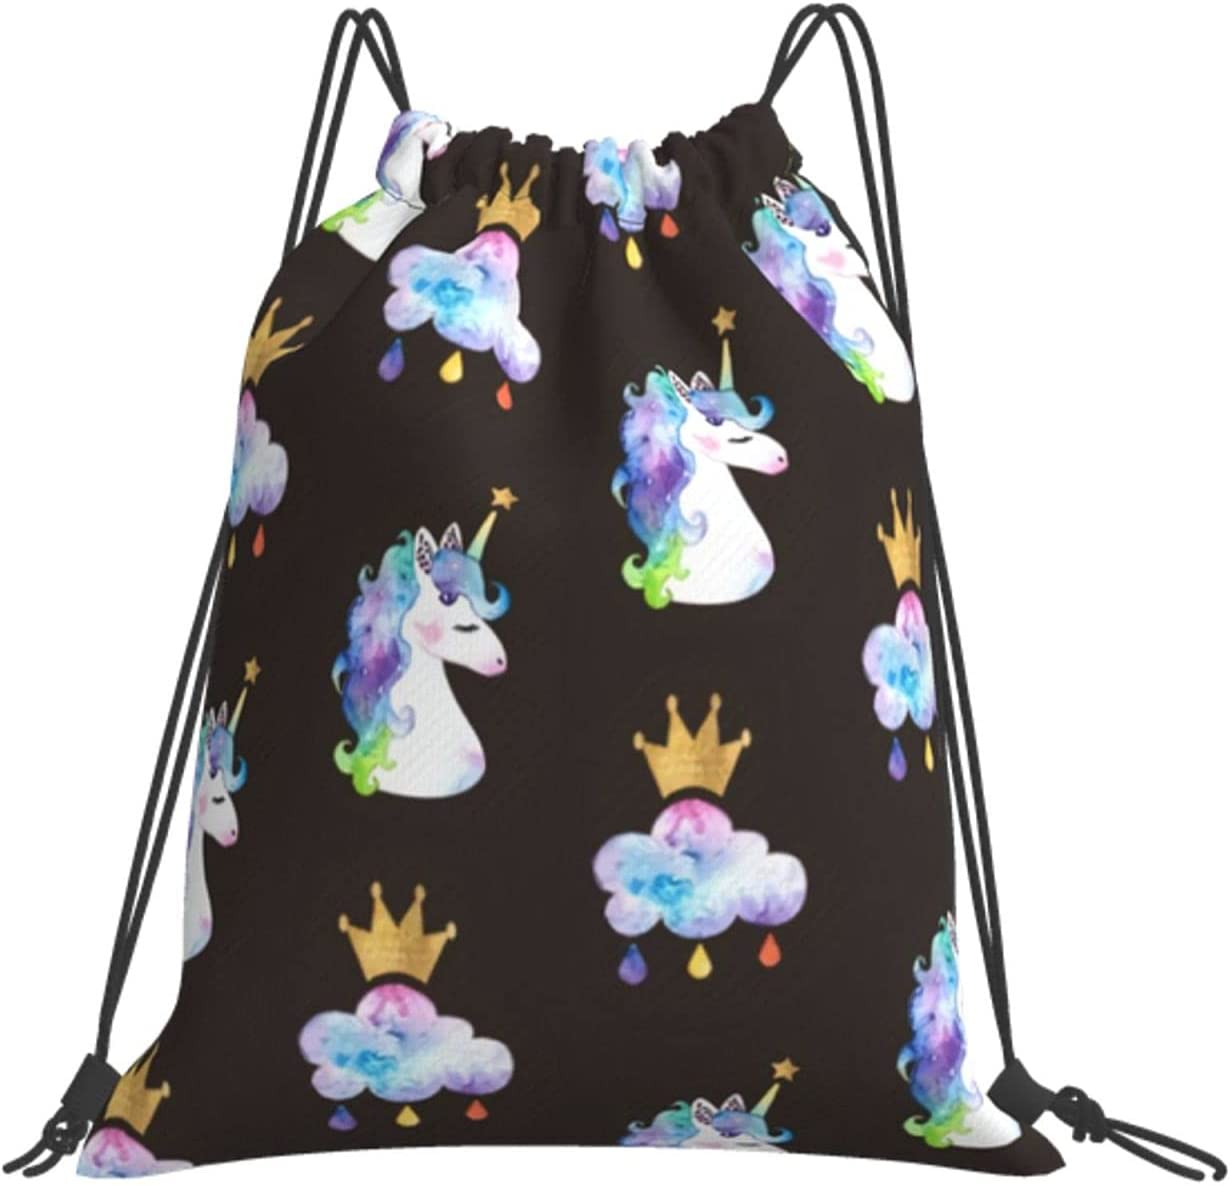 Unicorn Pure White Drawstring Backpack New color Sack Pack Sport Cinch Kansas City Mall Bag